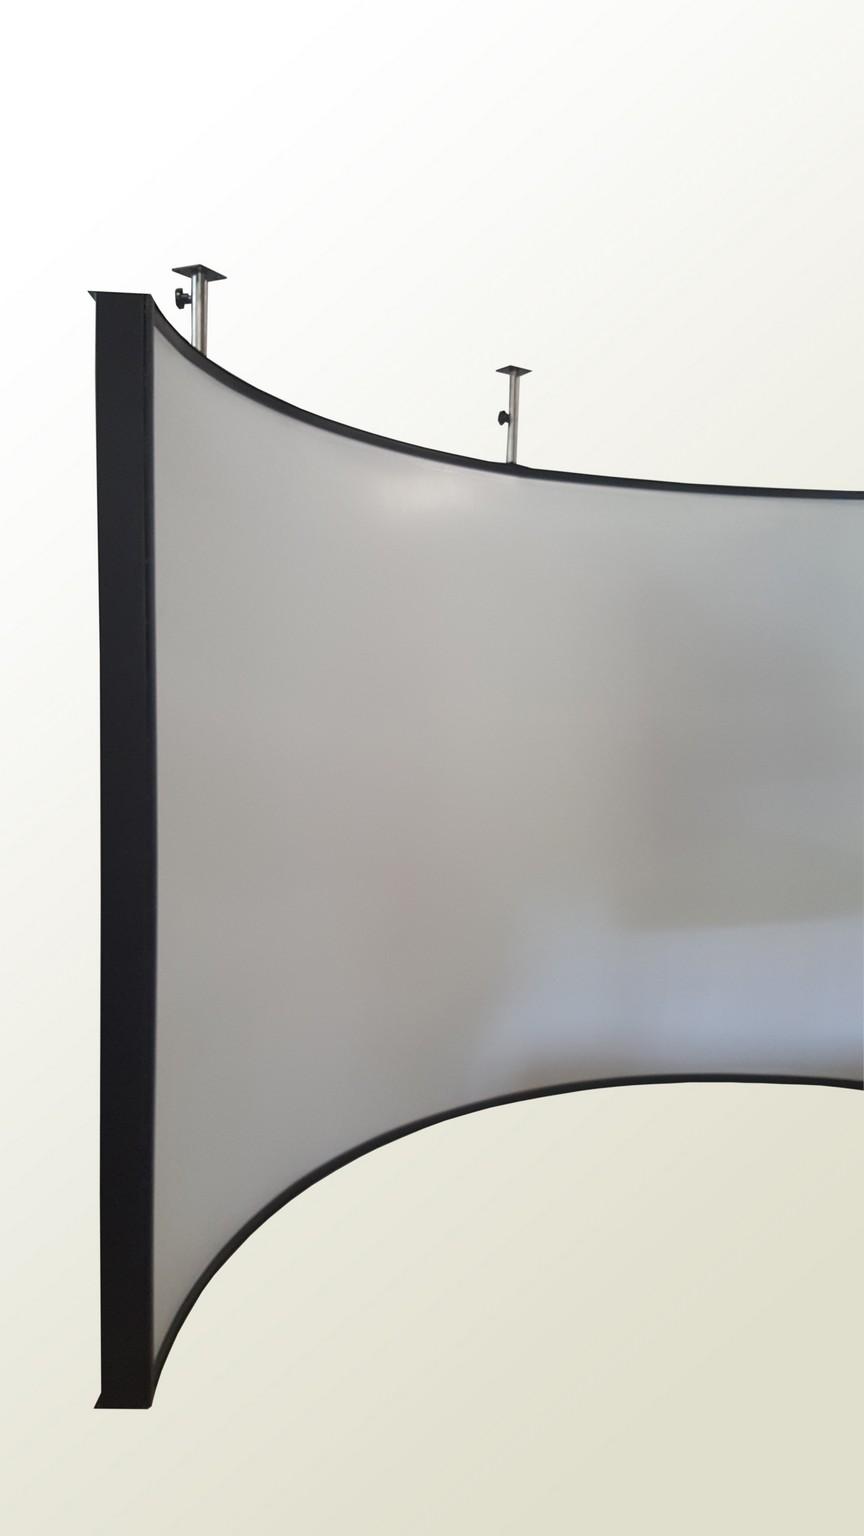 IRISECO cylindrical screen